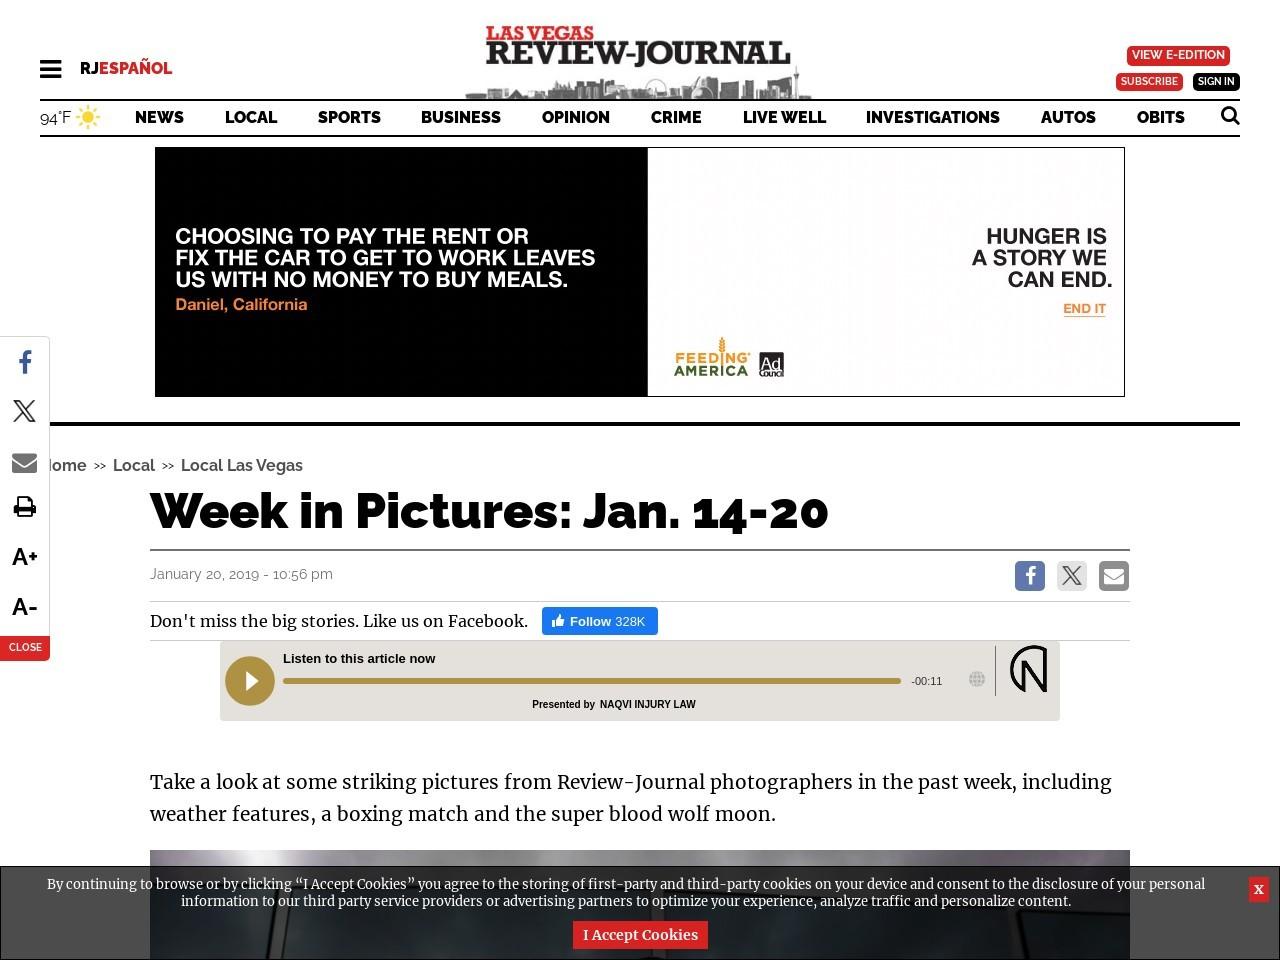 Week in Pictures: Jan. 14-20